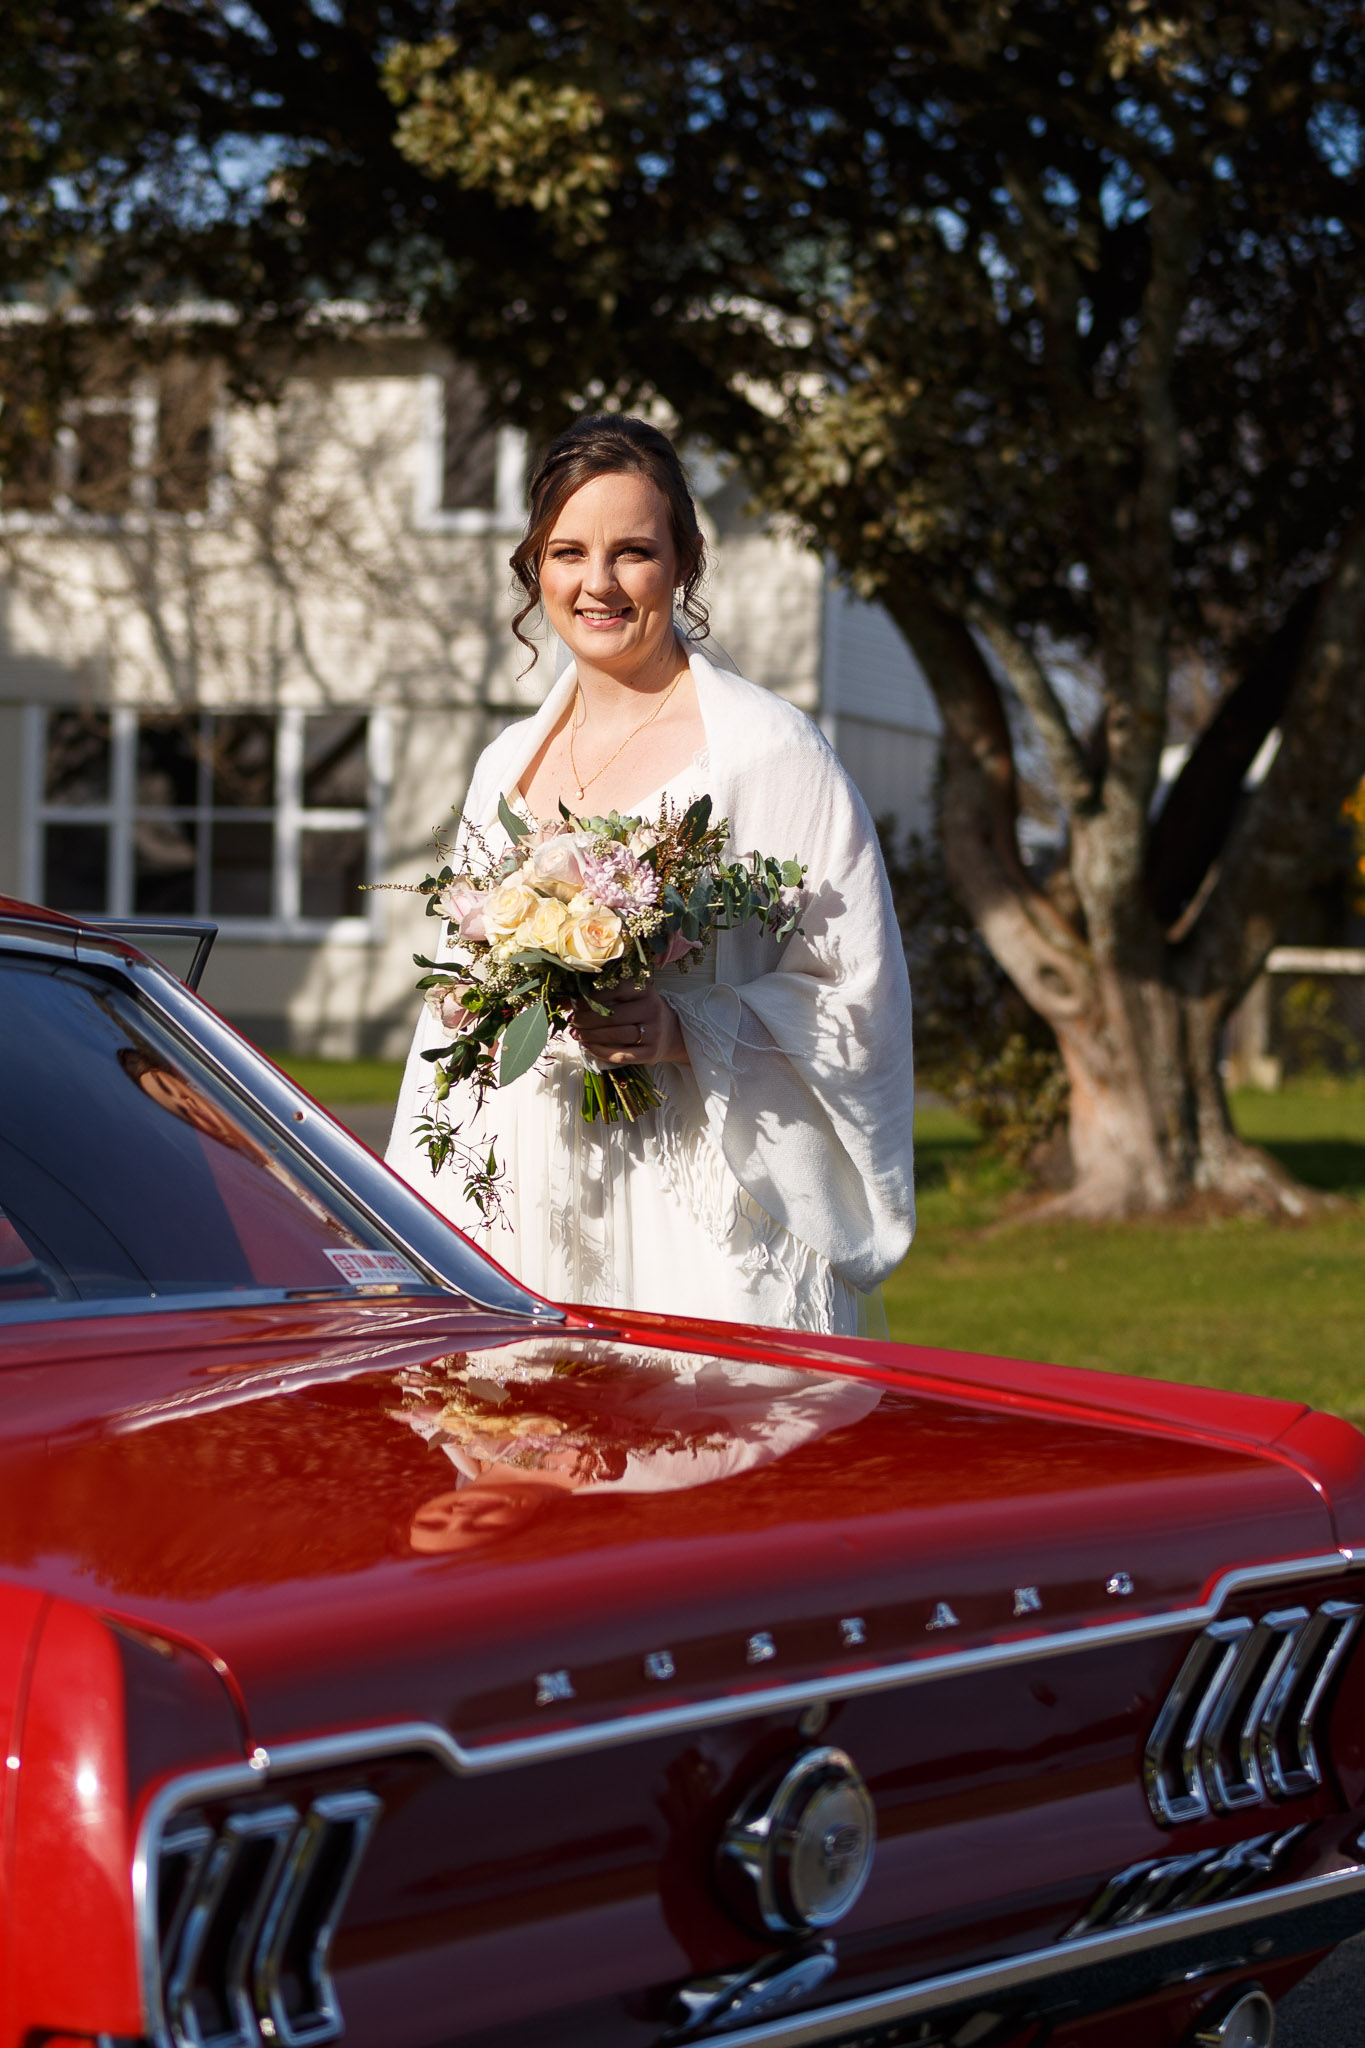 highlight_wedding_photography_manawatu_palmerston_north_new_zealand_rangitikei_golf_ohakea-18.jpg